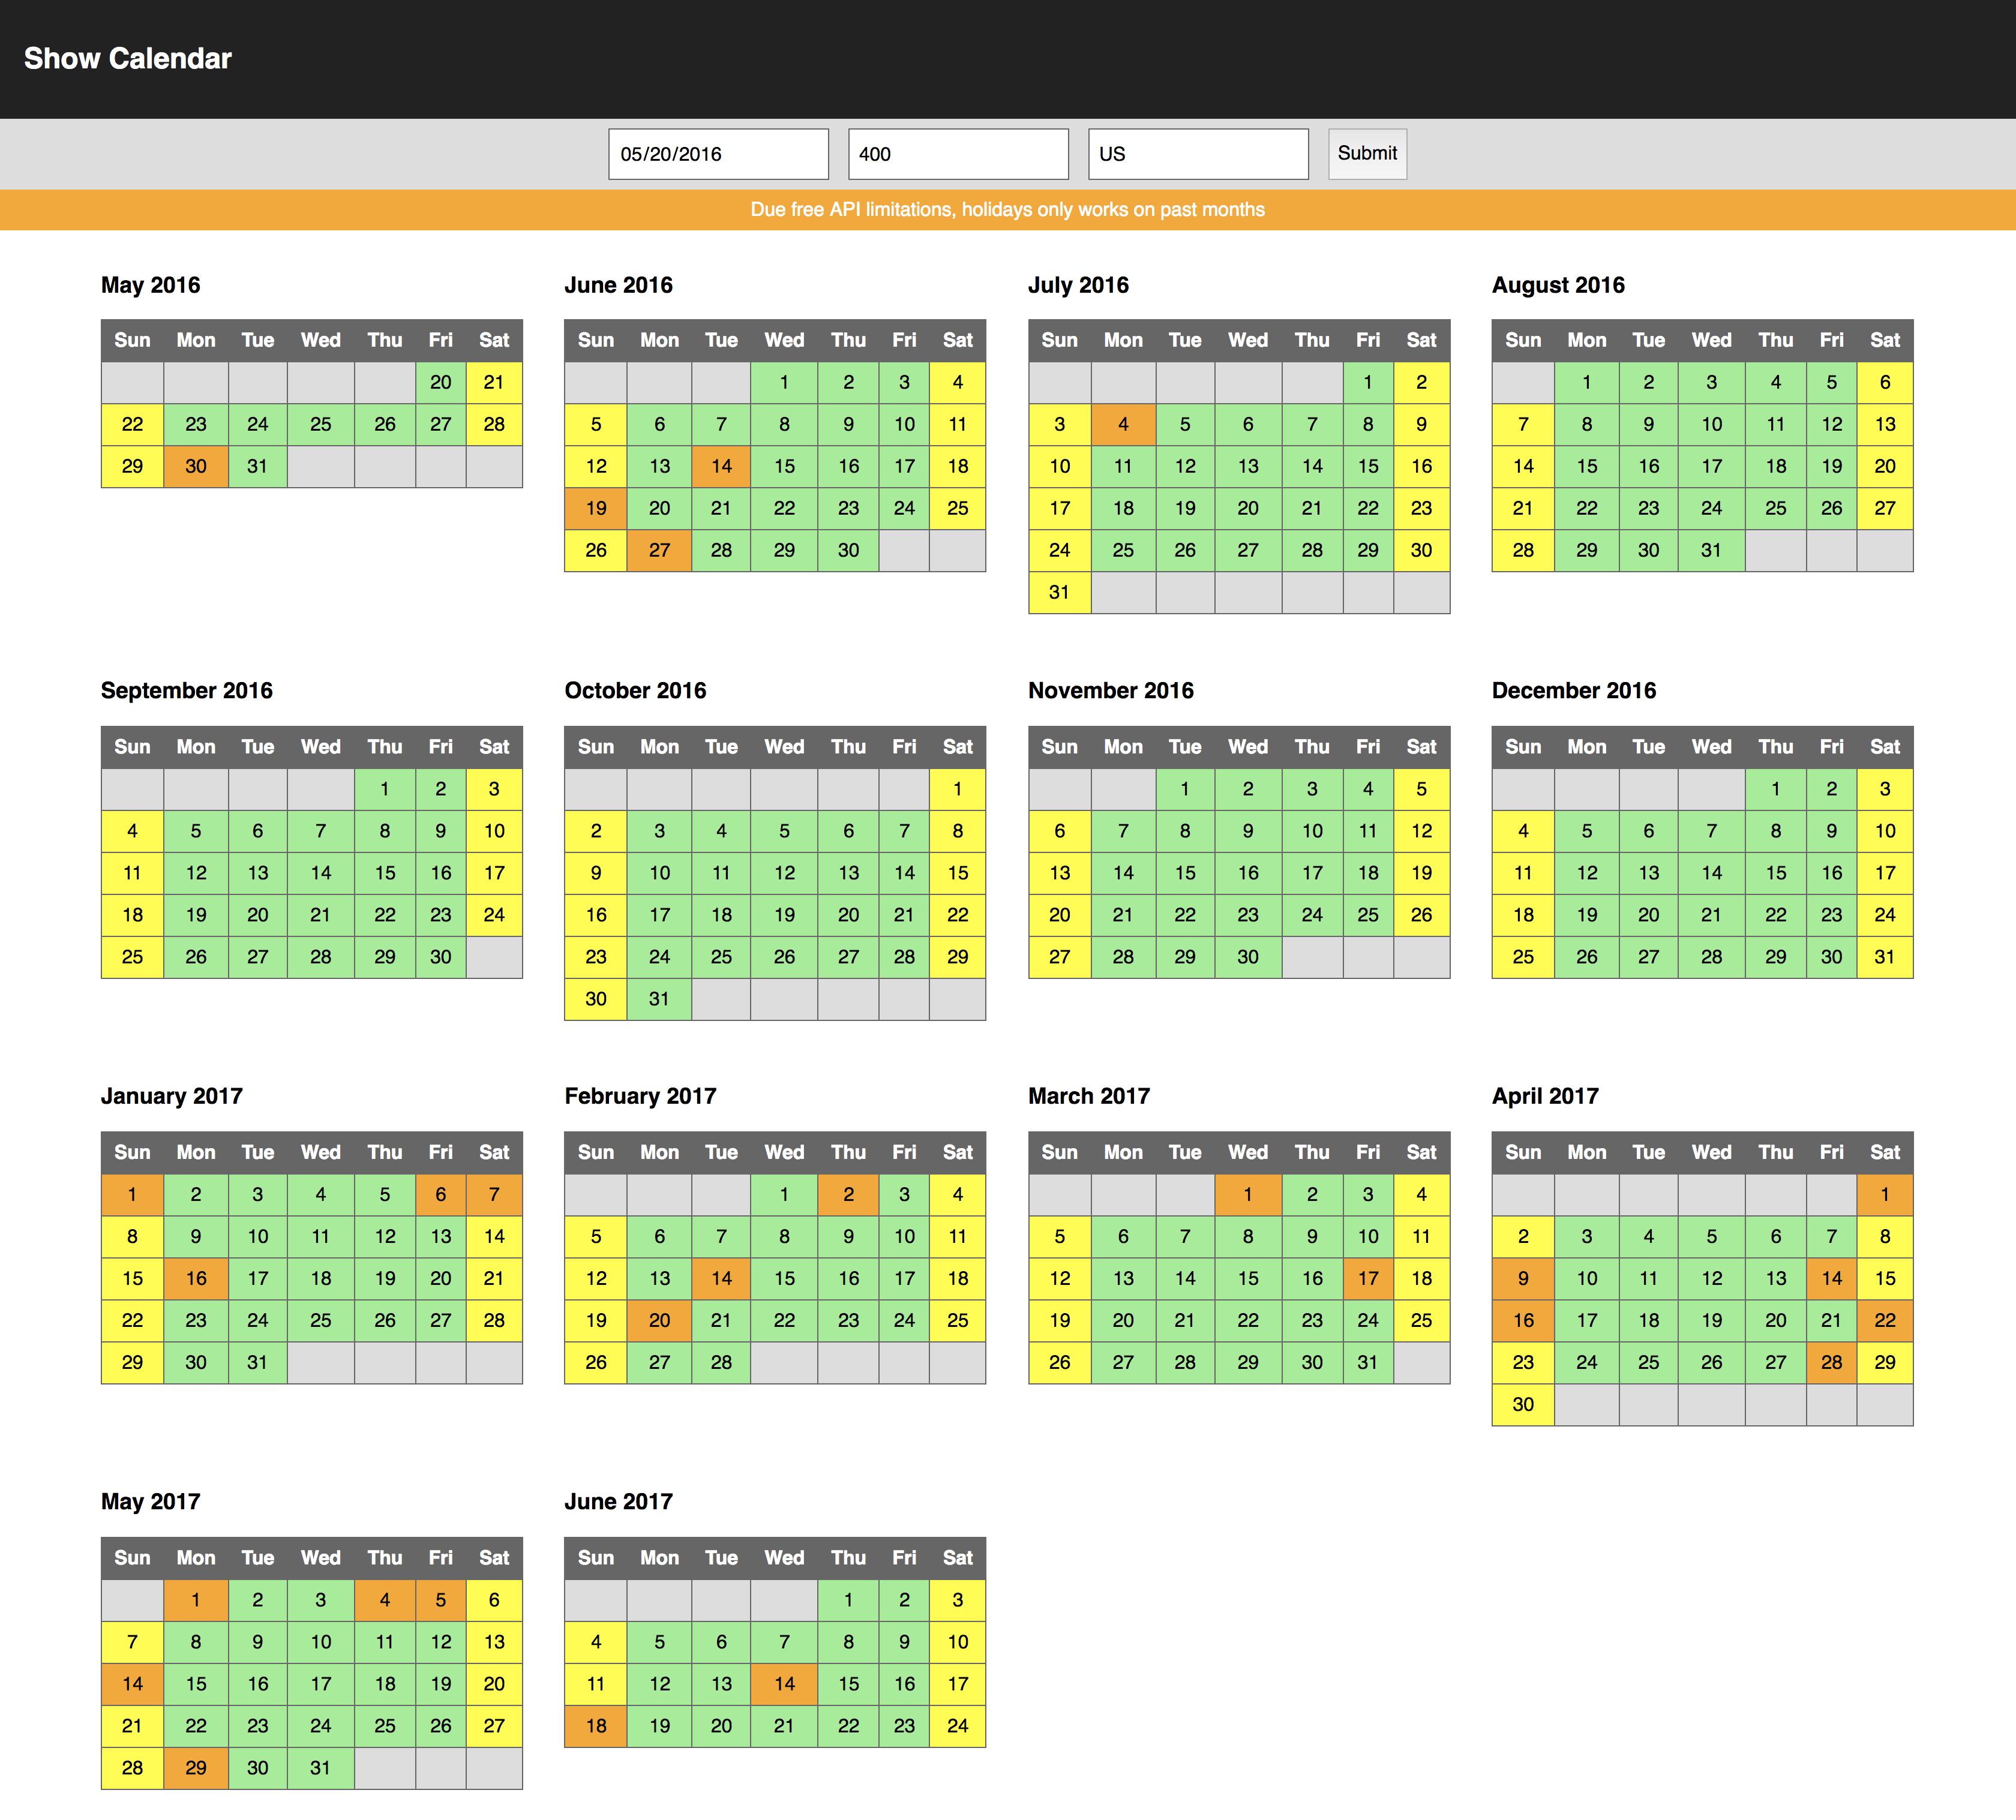 fmontes github io_show-calendar_